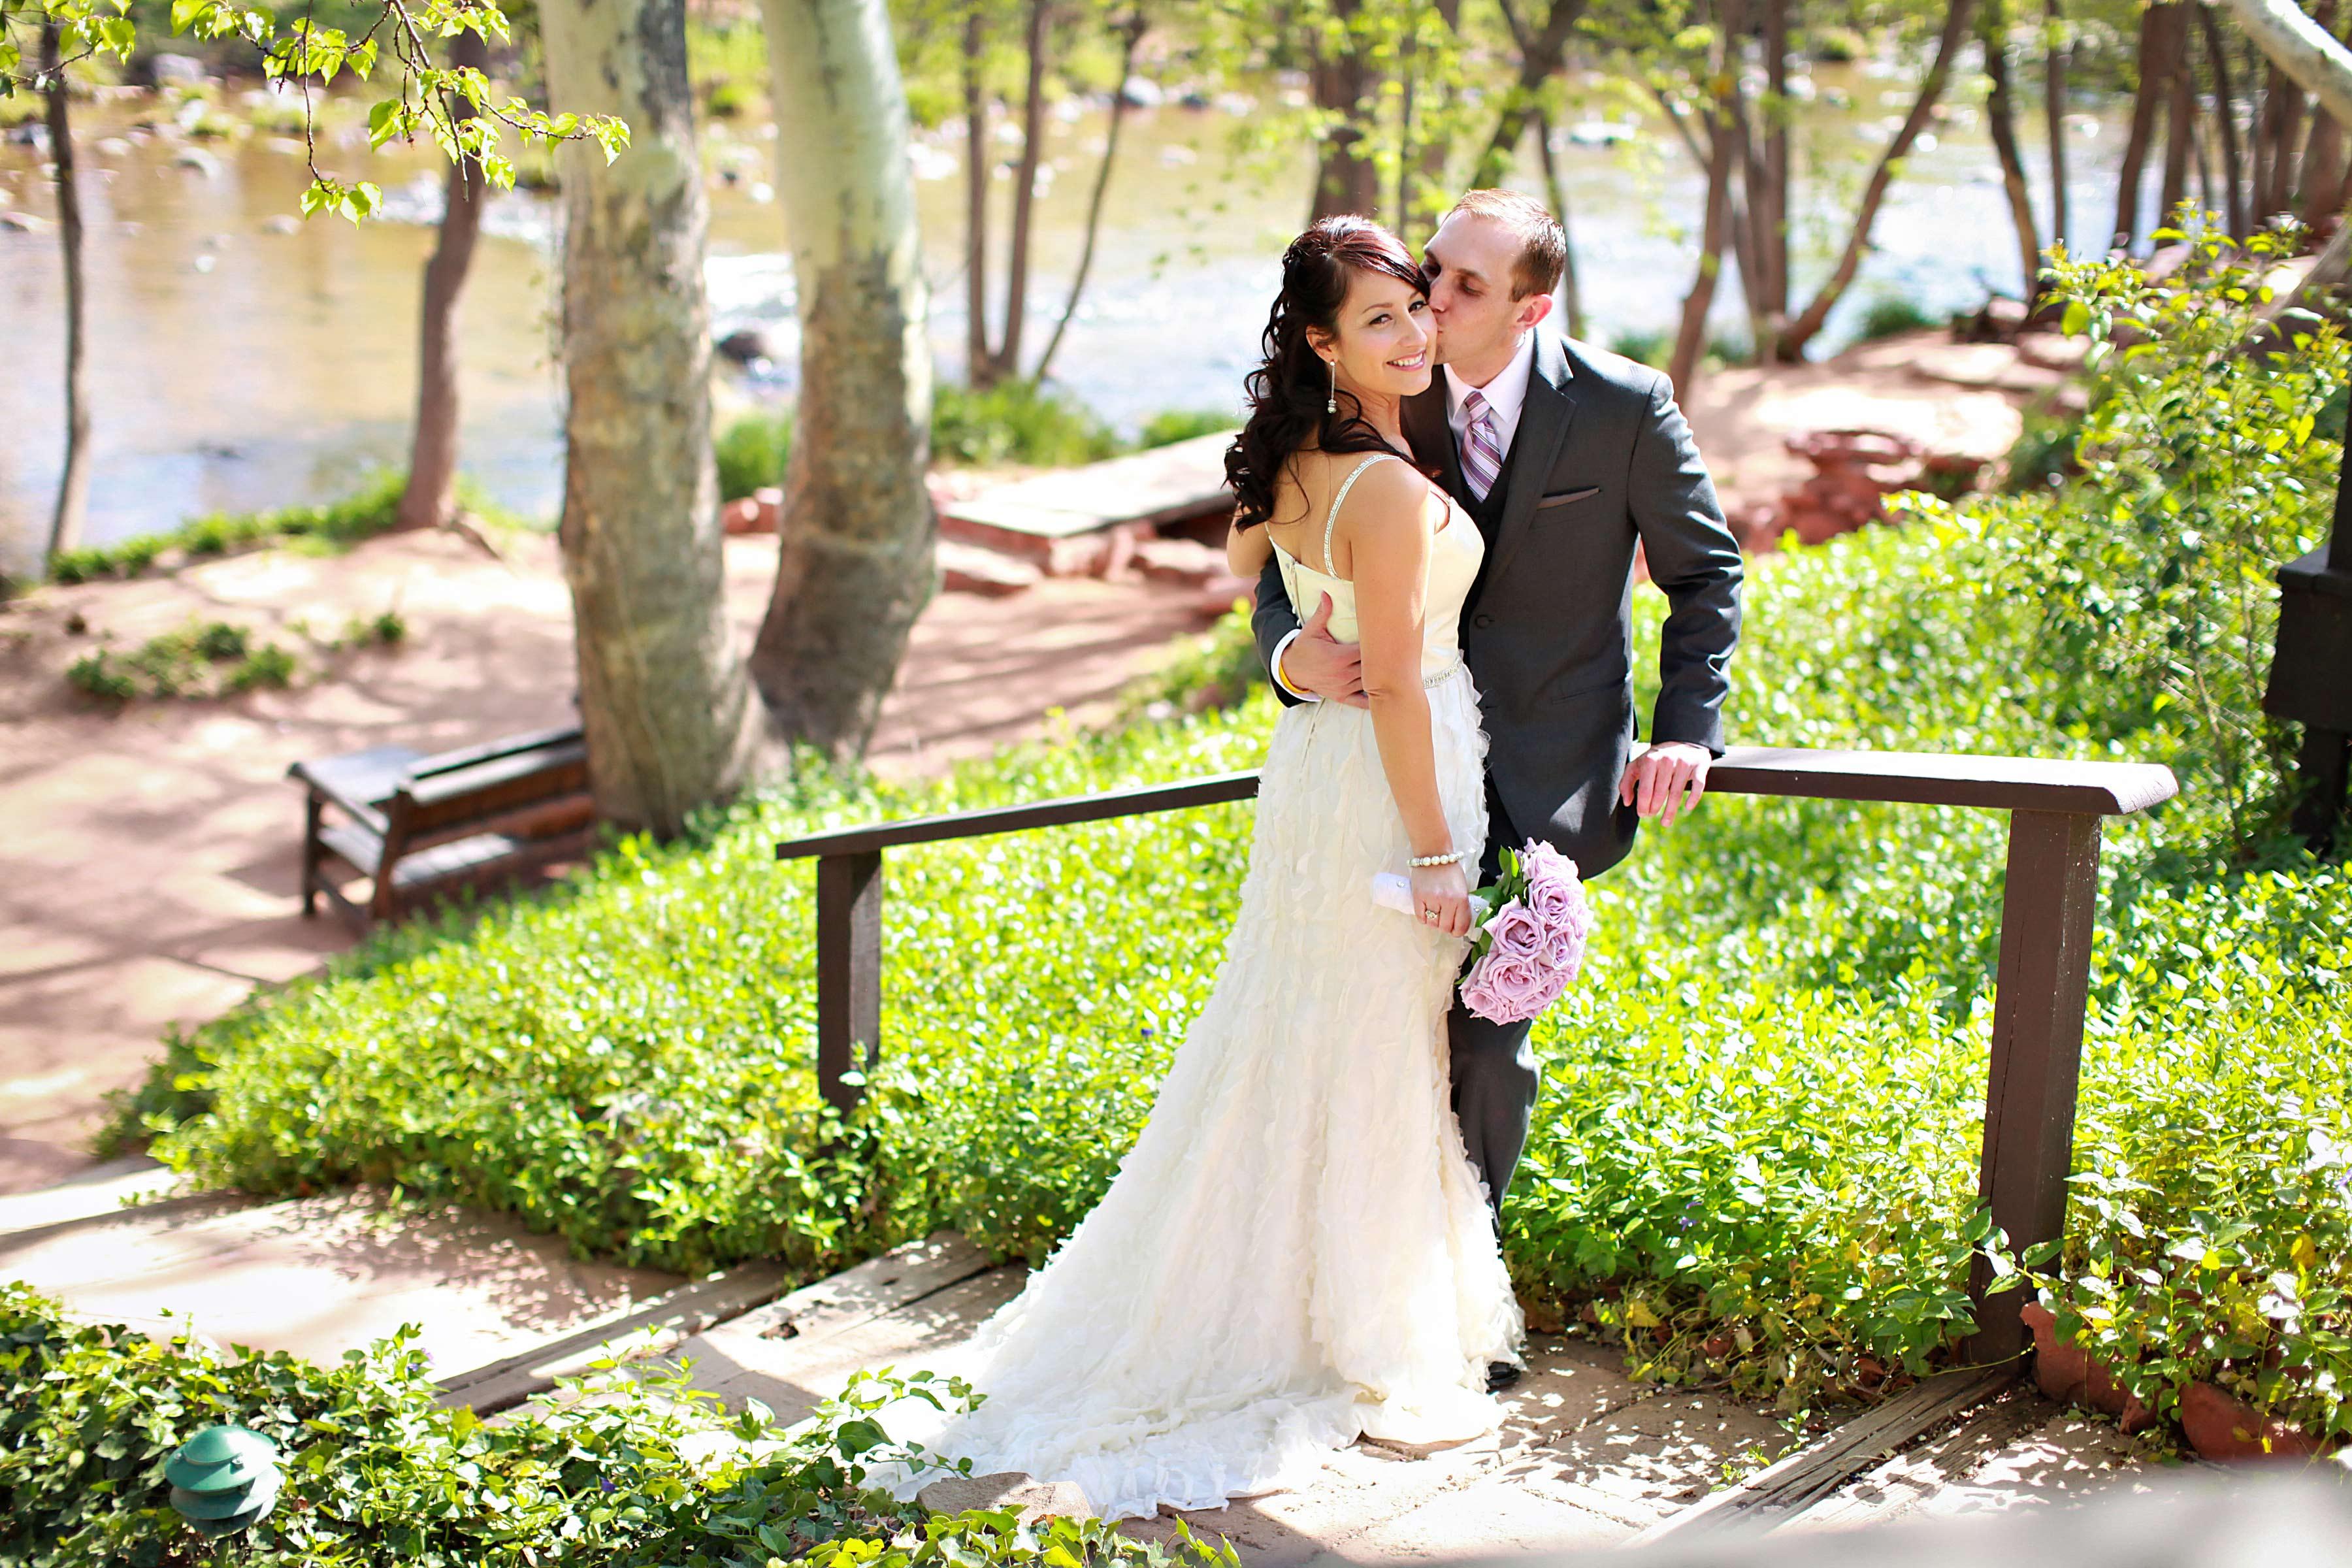 Lauberge de sedona wedding venue sedona arizona junebug best wedding venues in sedona arizona junglespirit Image collections